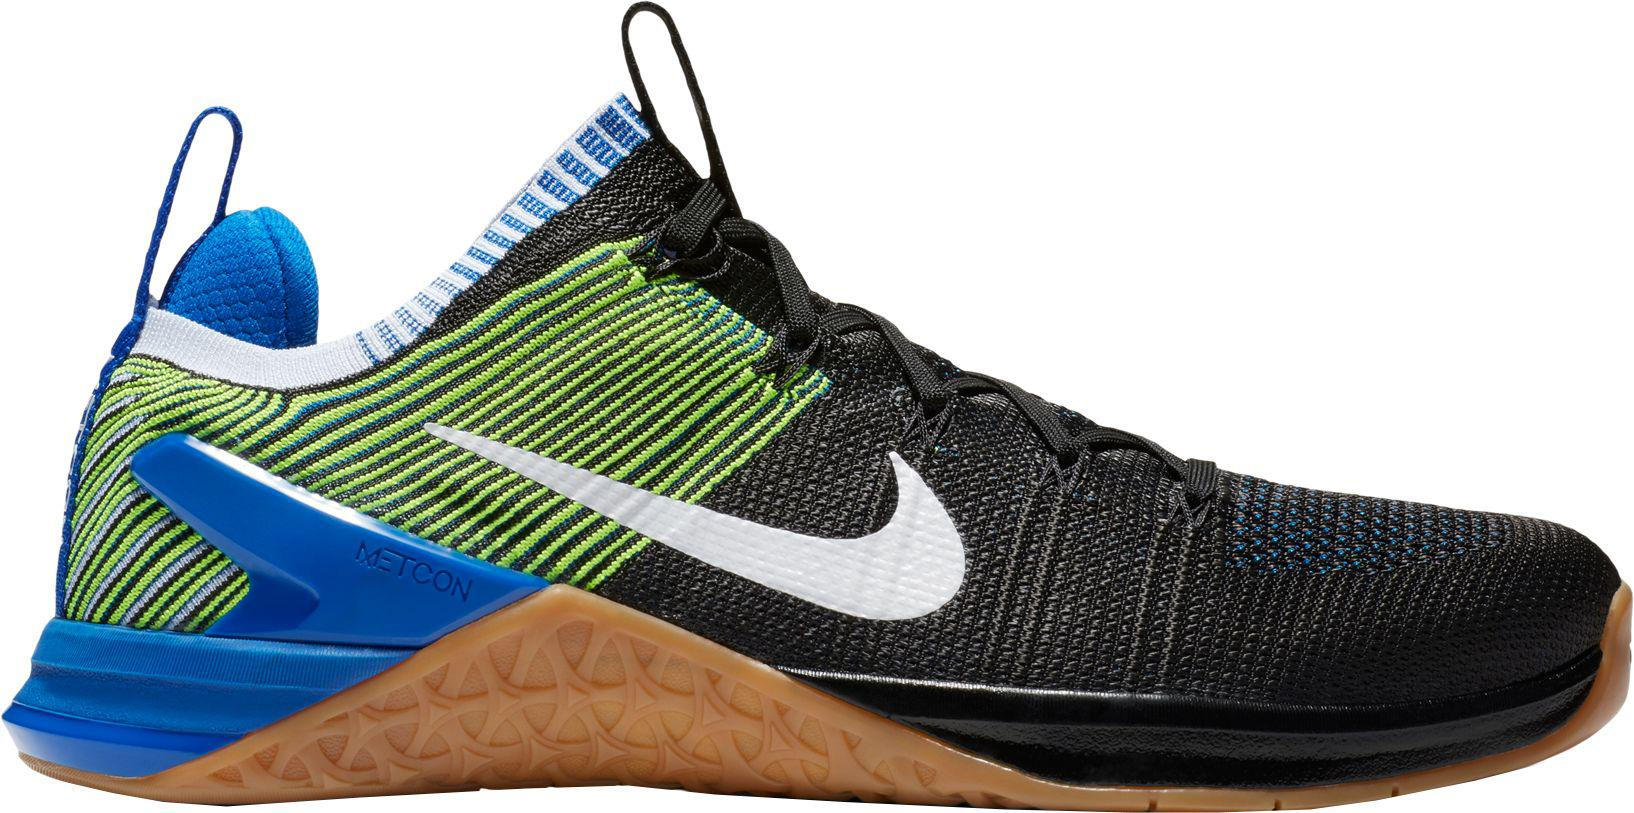 ea1755fe5392b8 Nike - Multicolor Metcon Dsx Flyknit 2 Training Shoes for Men - Lyst